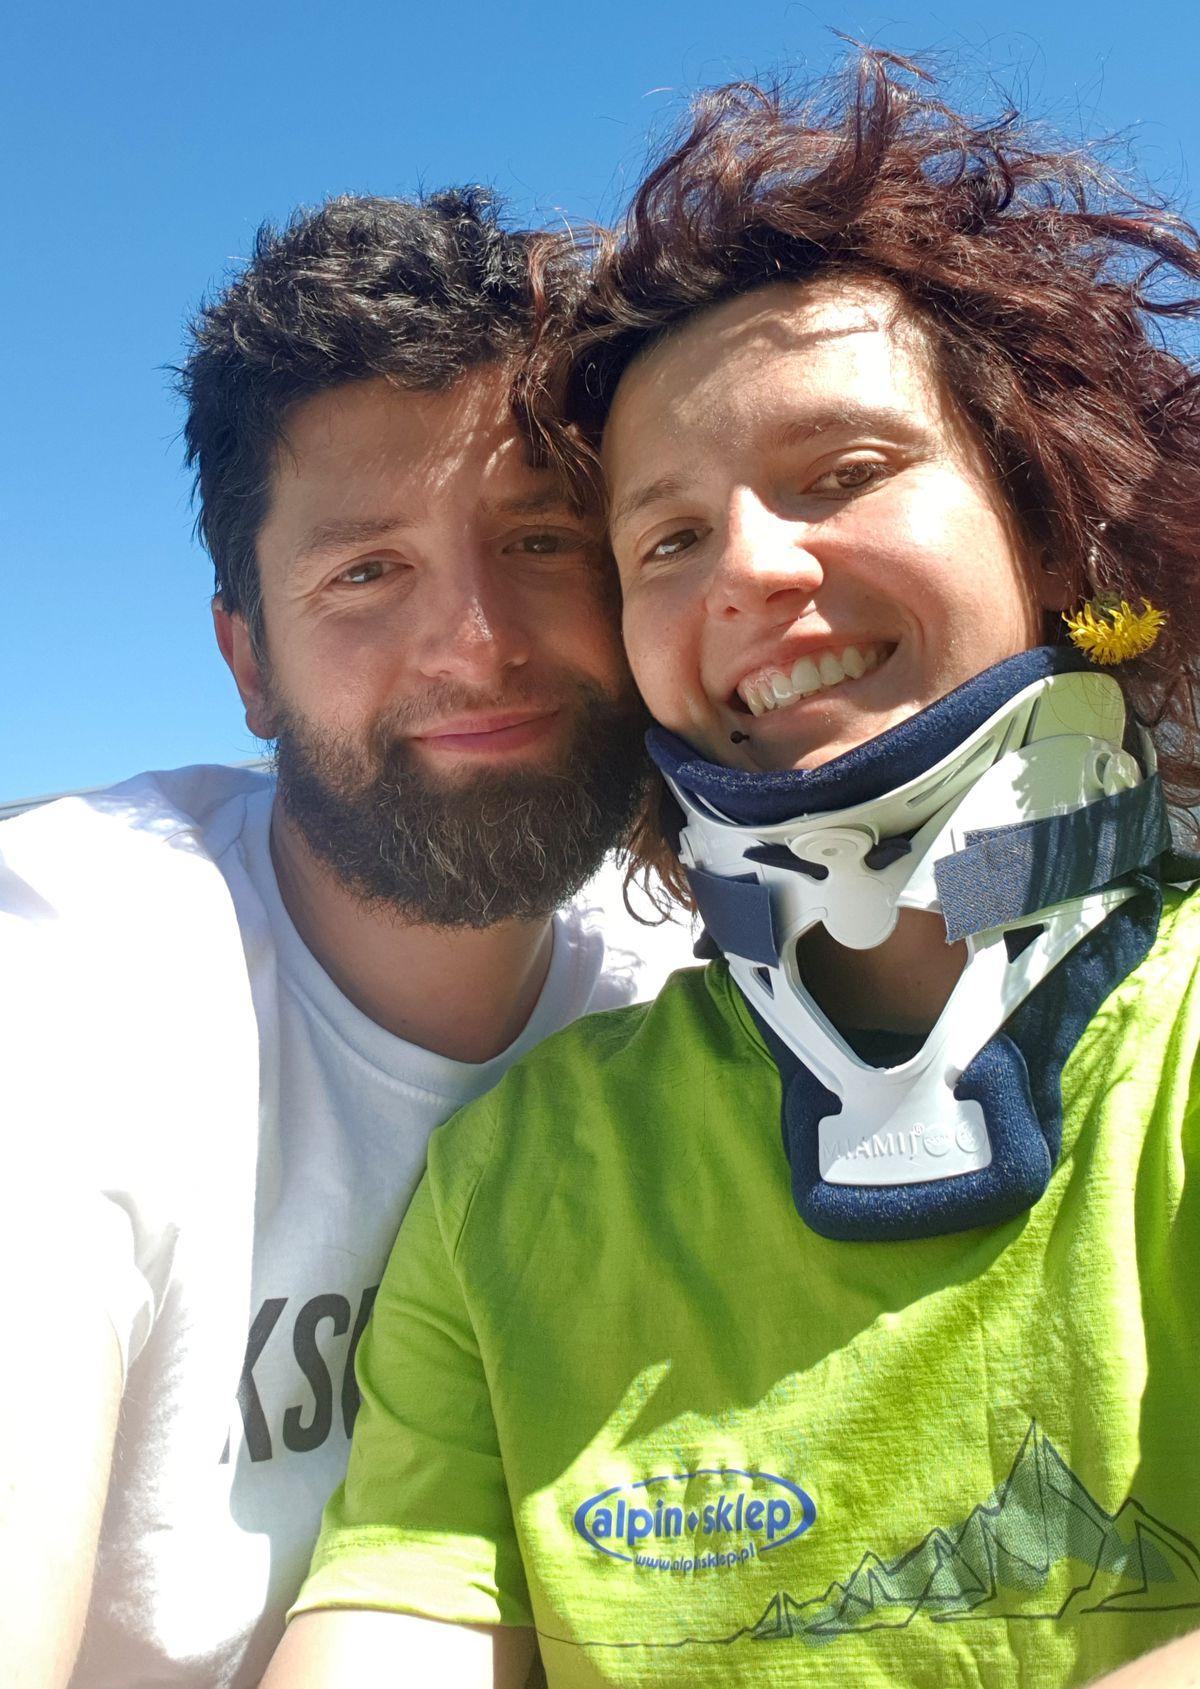 Michael Wangrat and Magdalena Czarnecka on June 2, 2018, in Anchorage. (Photo courtesy Magdalena Czarnecka and Michael Wangrat)